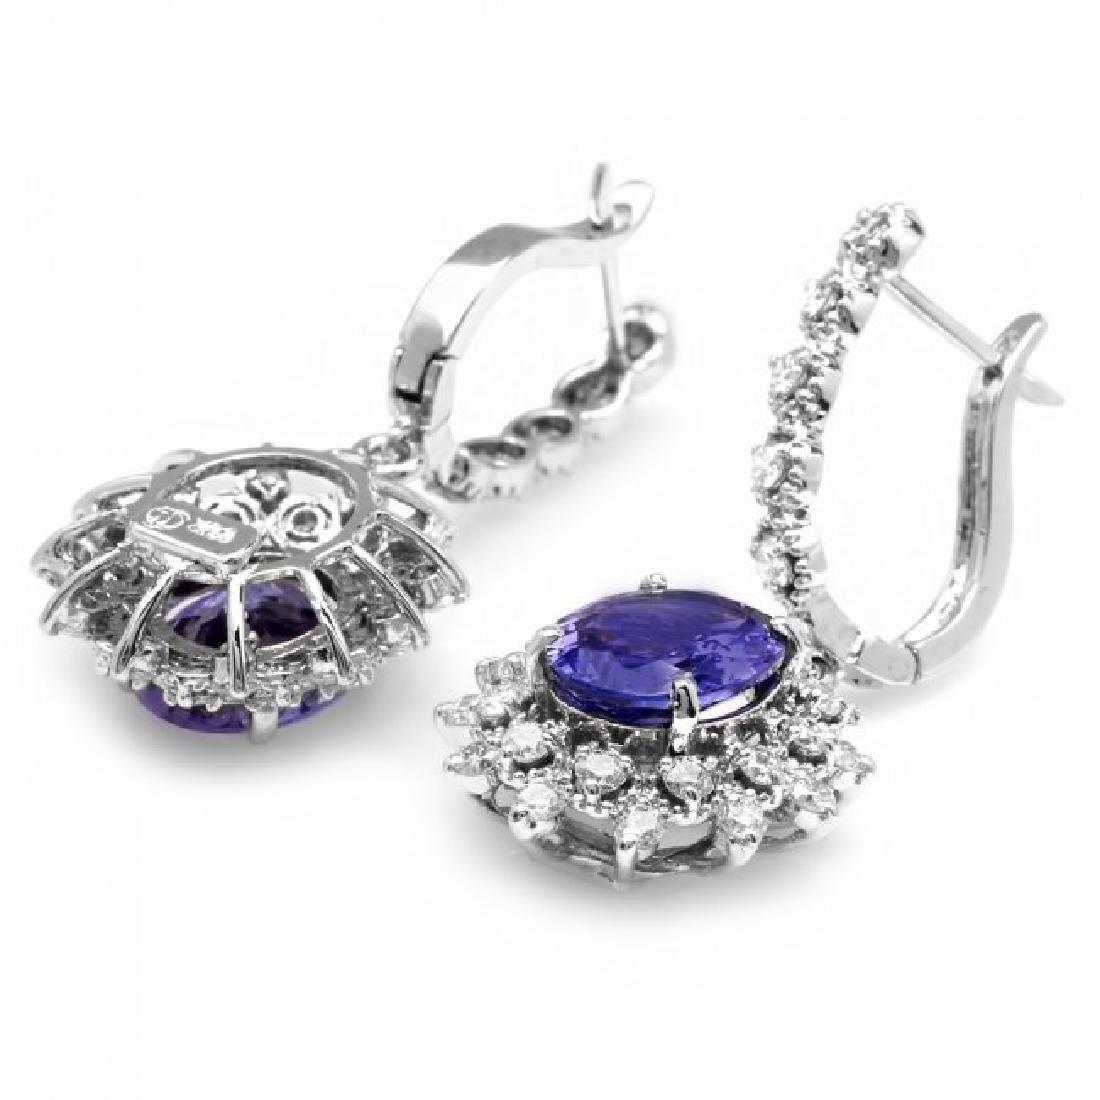 14k Gold 5ct Tanzanite 1.60ct Diamond Earrings - 2